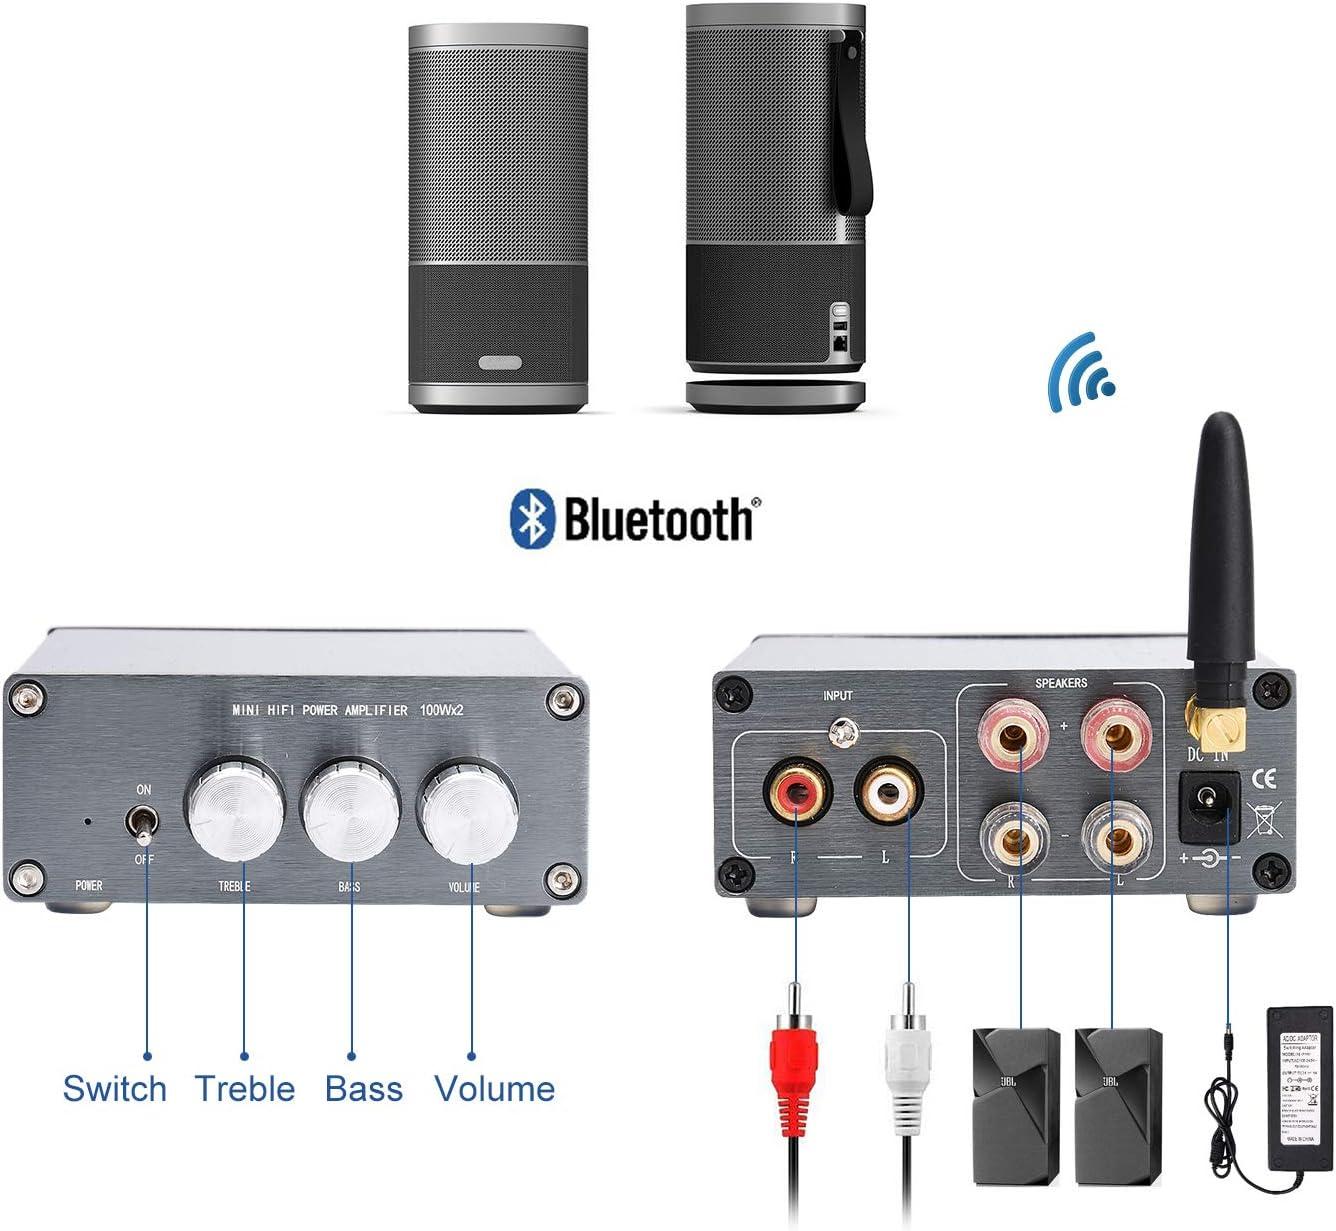 Free Amazon Promo Code 2020 for Bluetooth Stereo Audio Dual